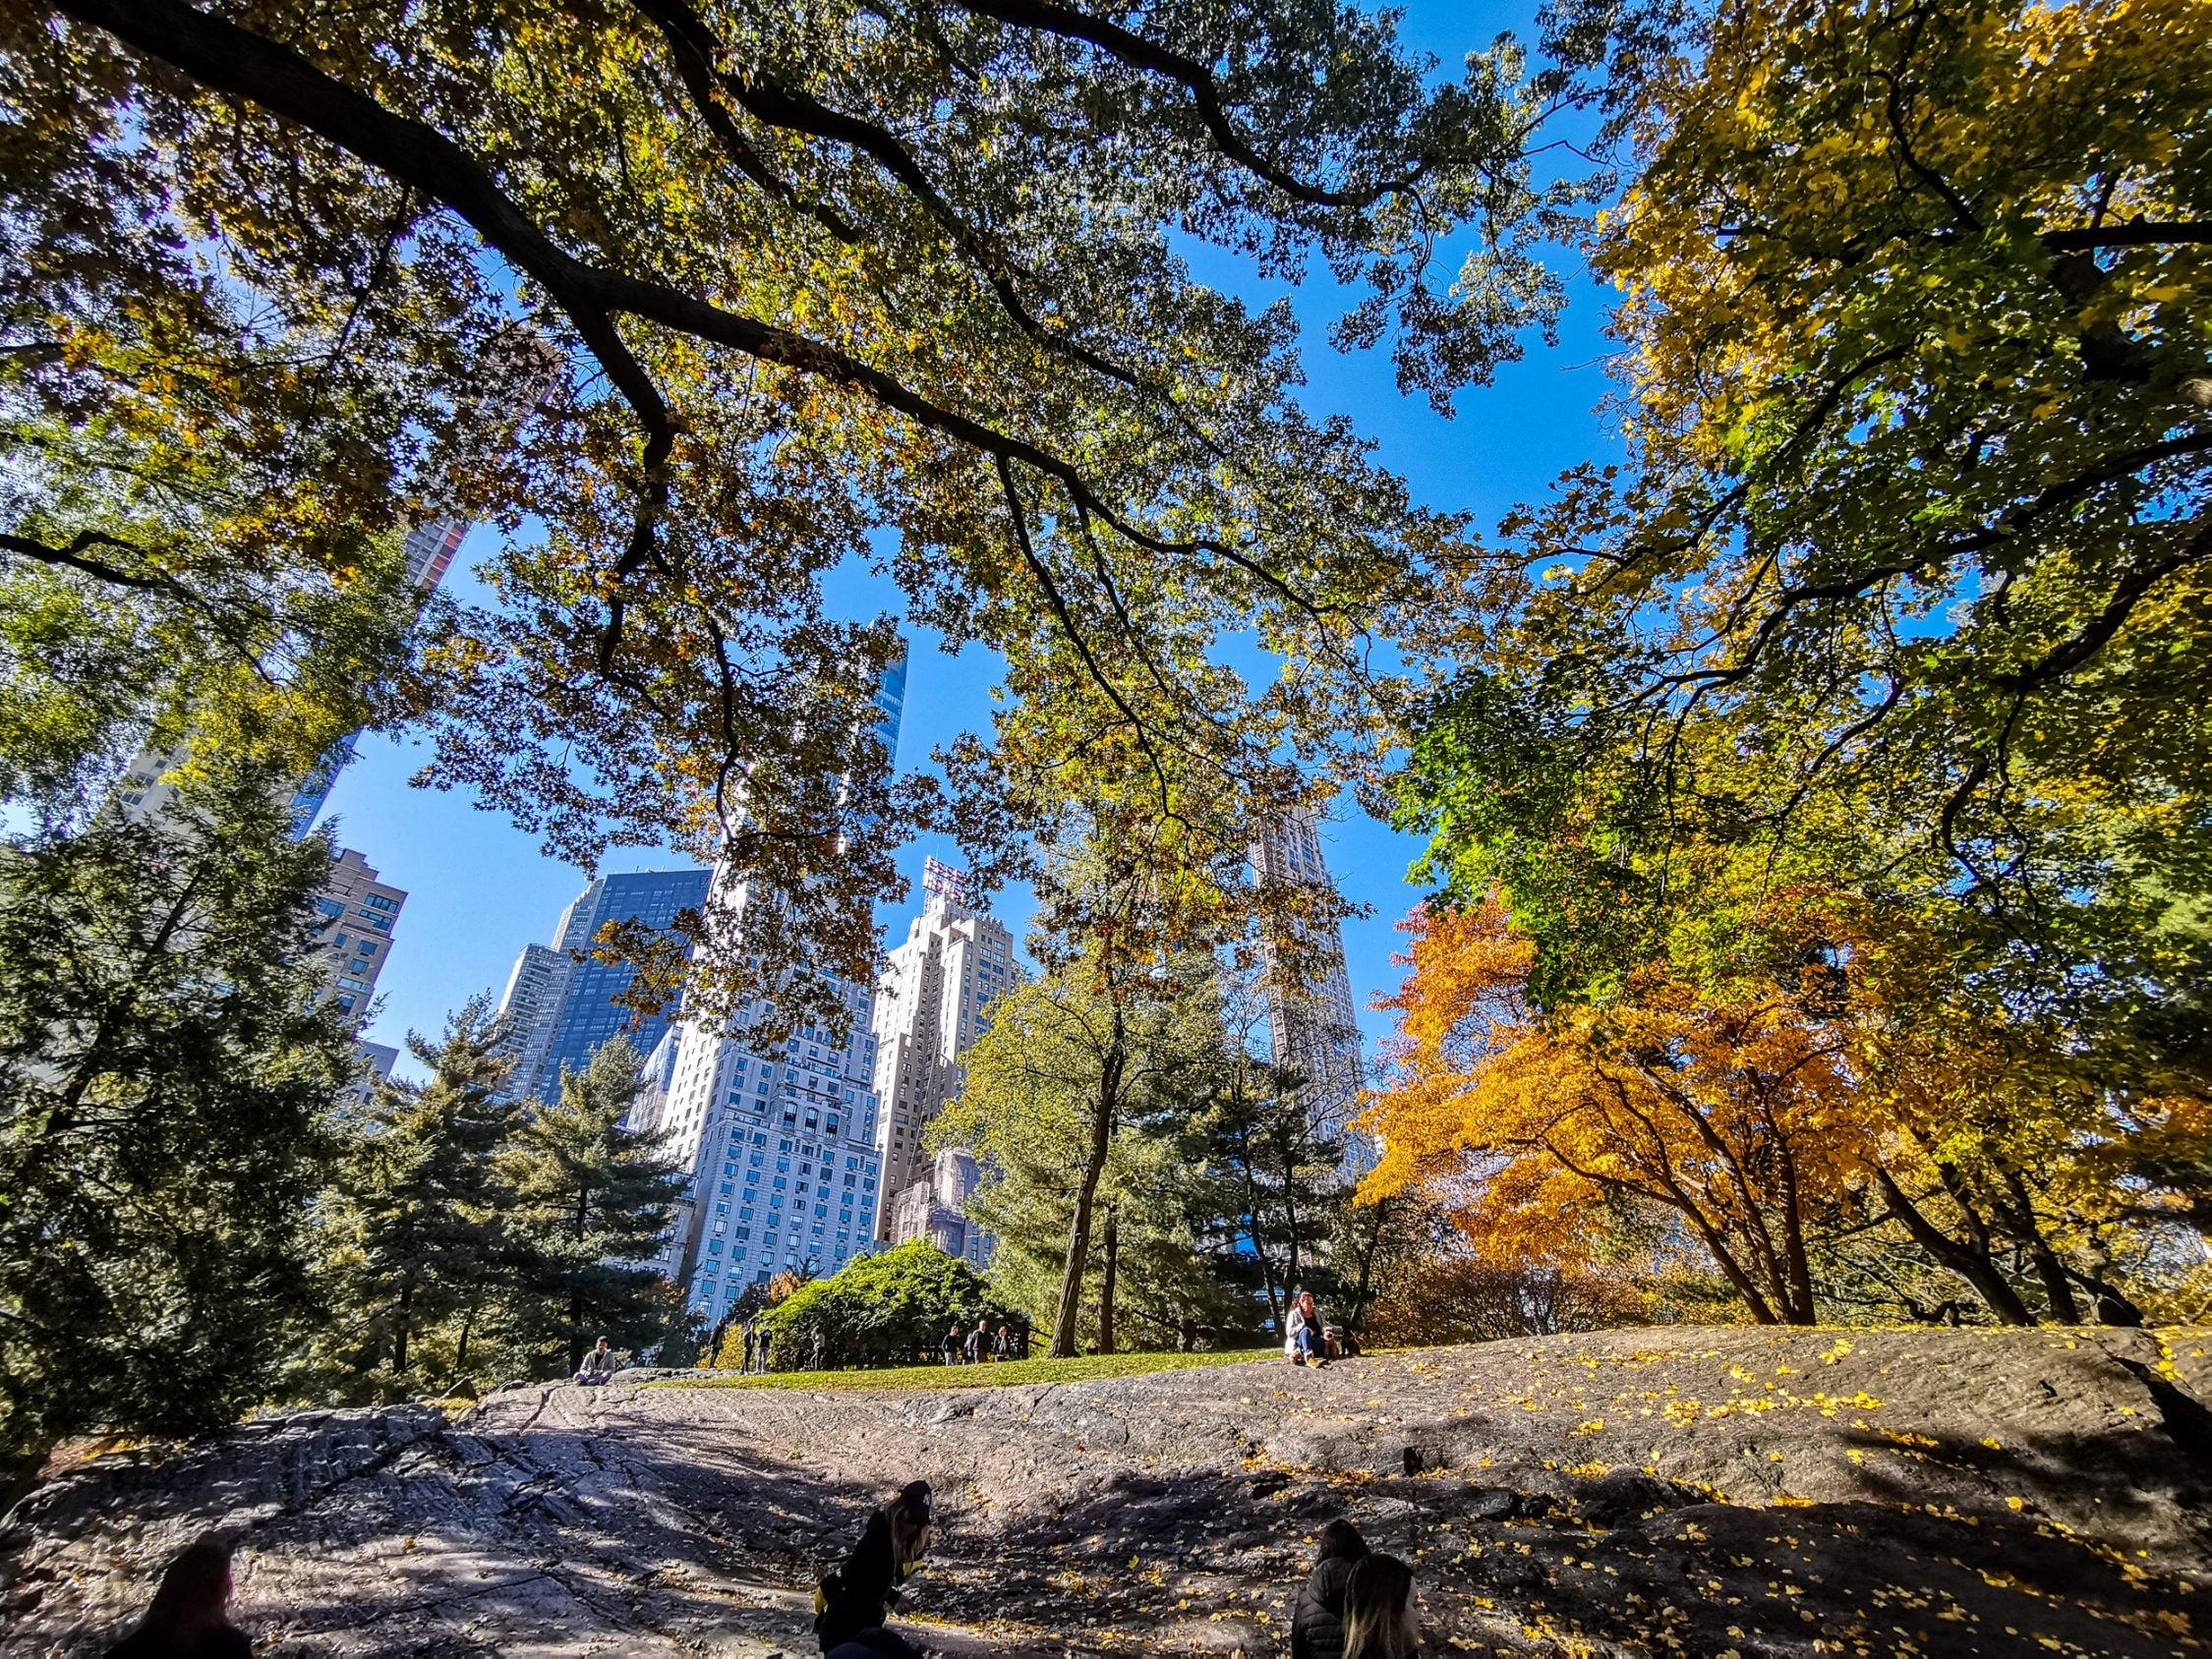 Central Park: New York City